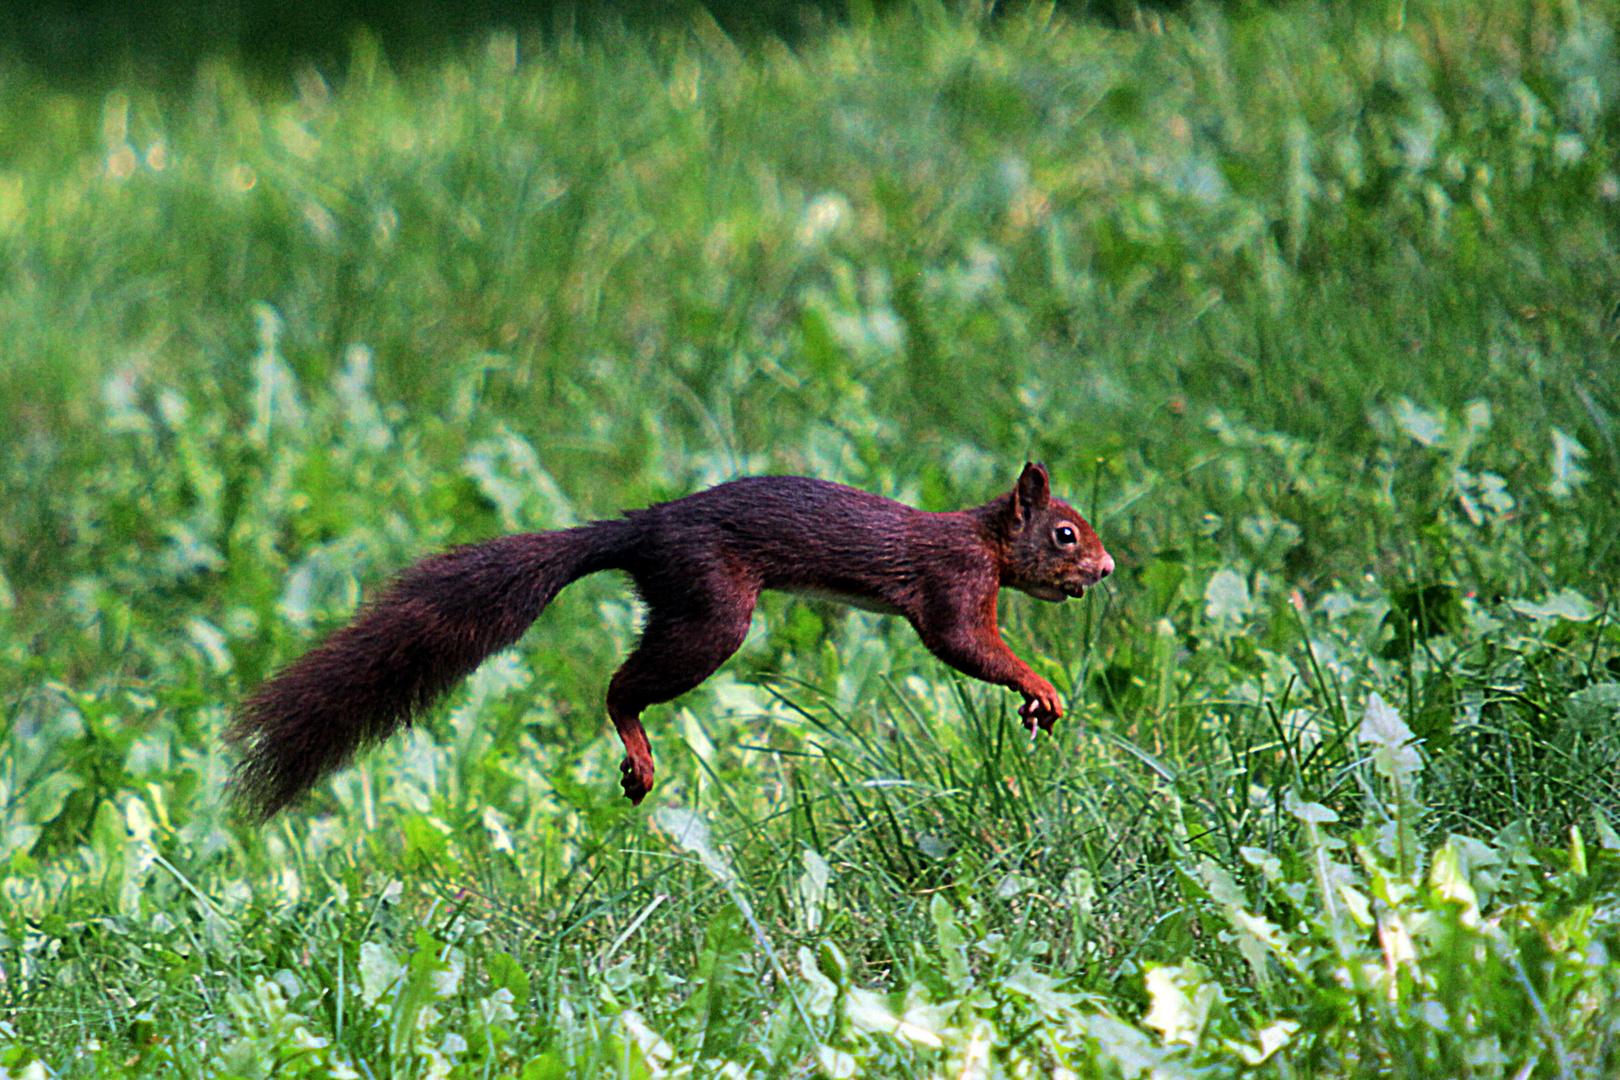 Jumping Jack Squirrel